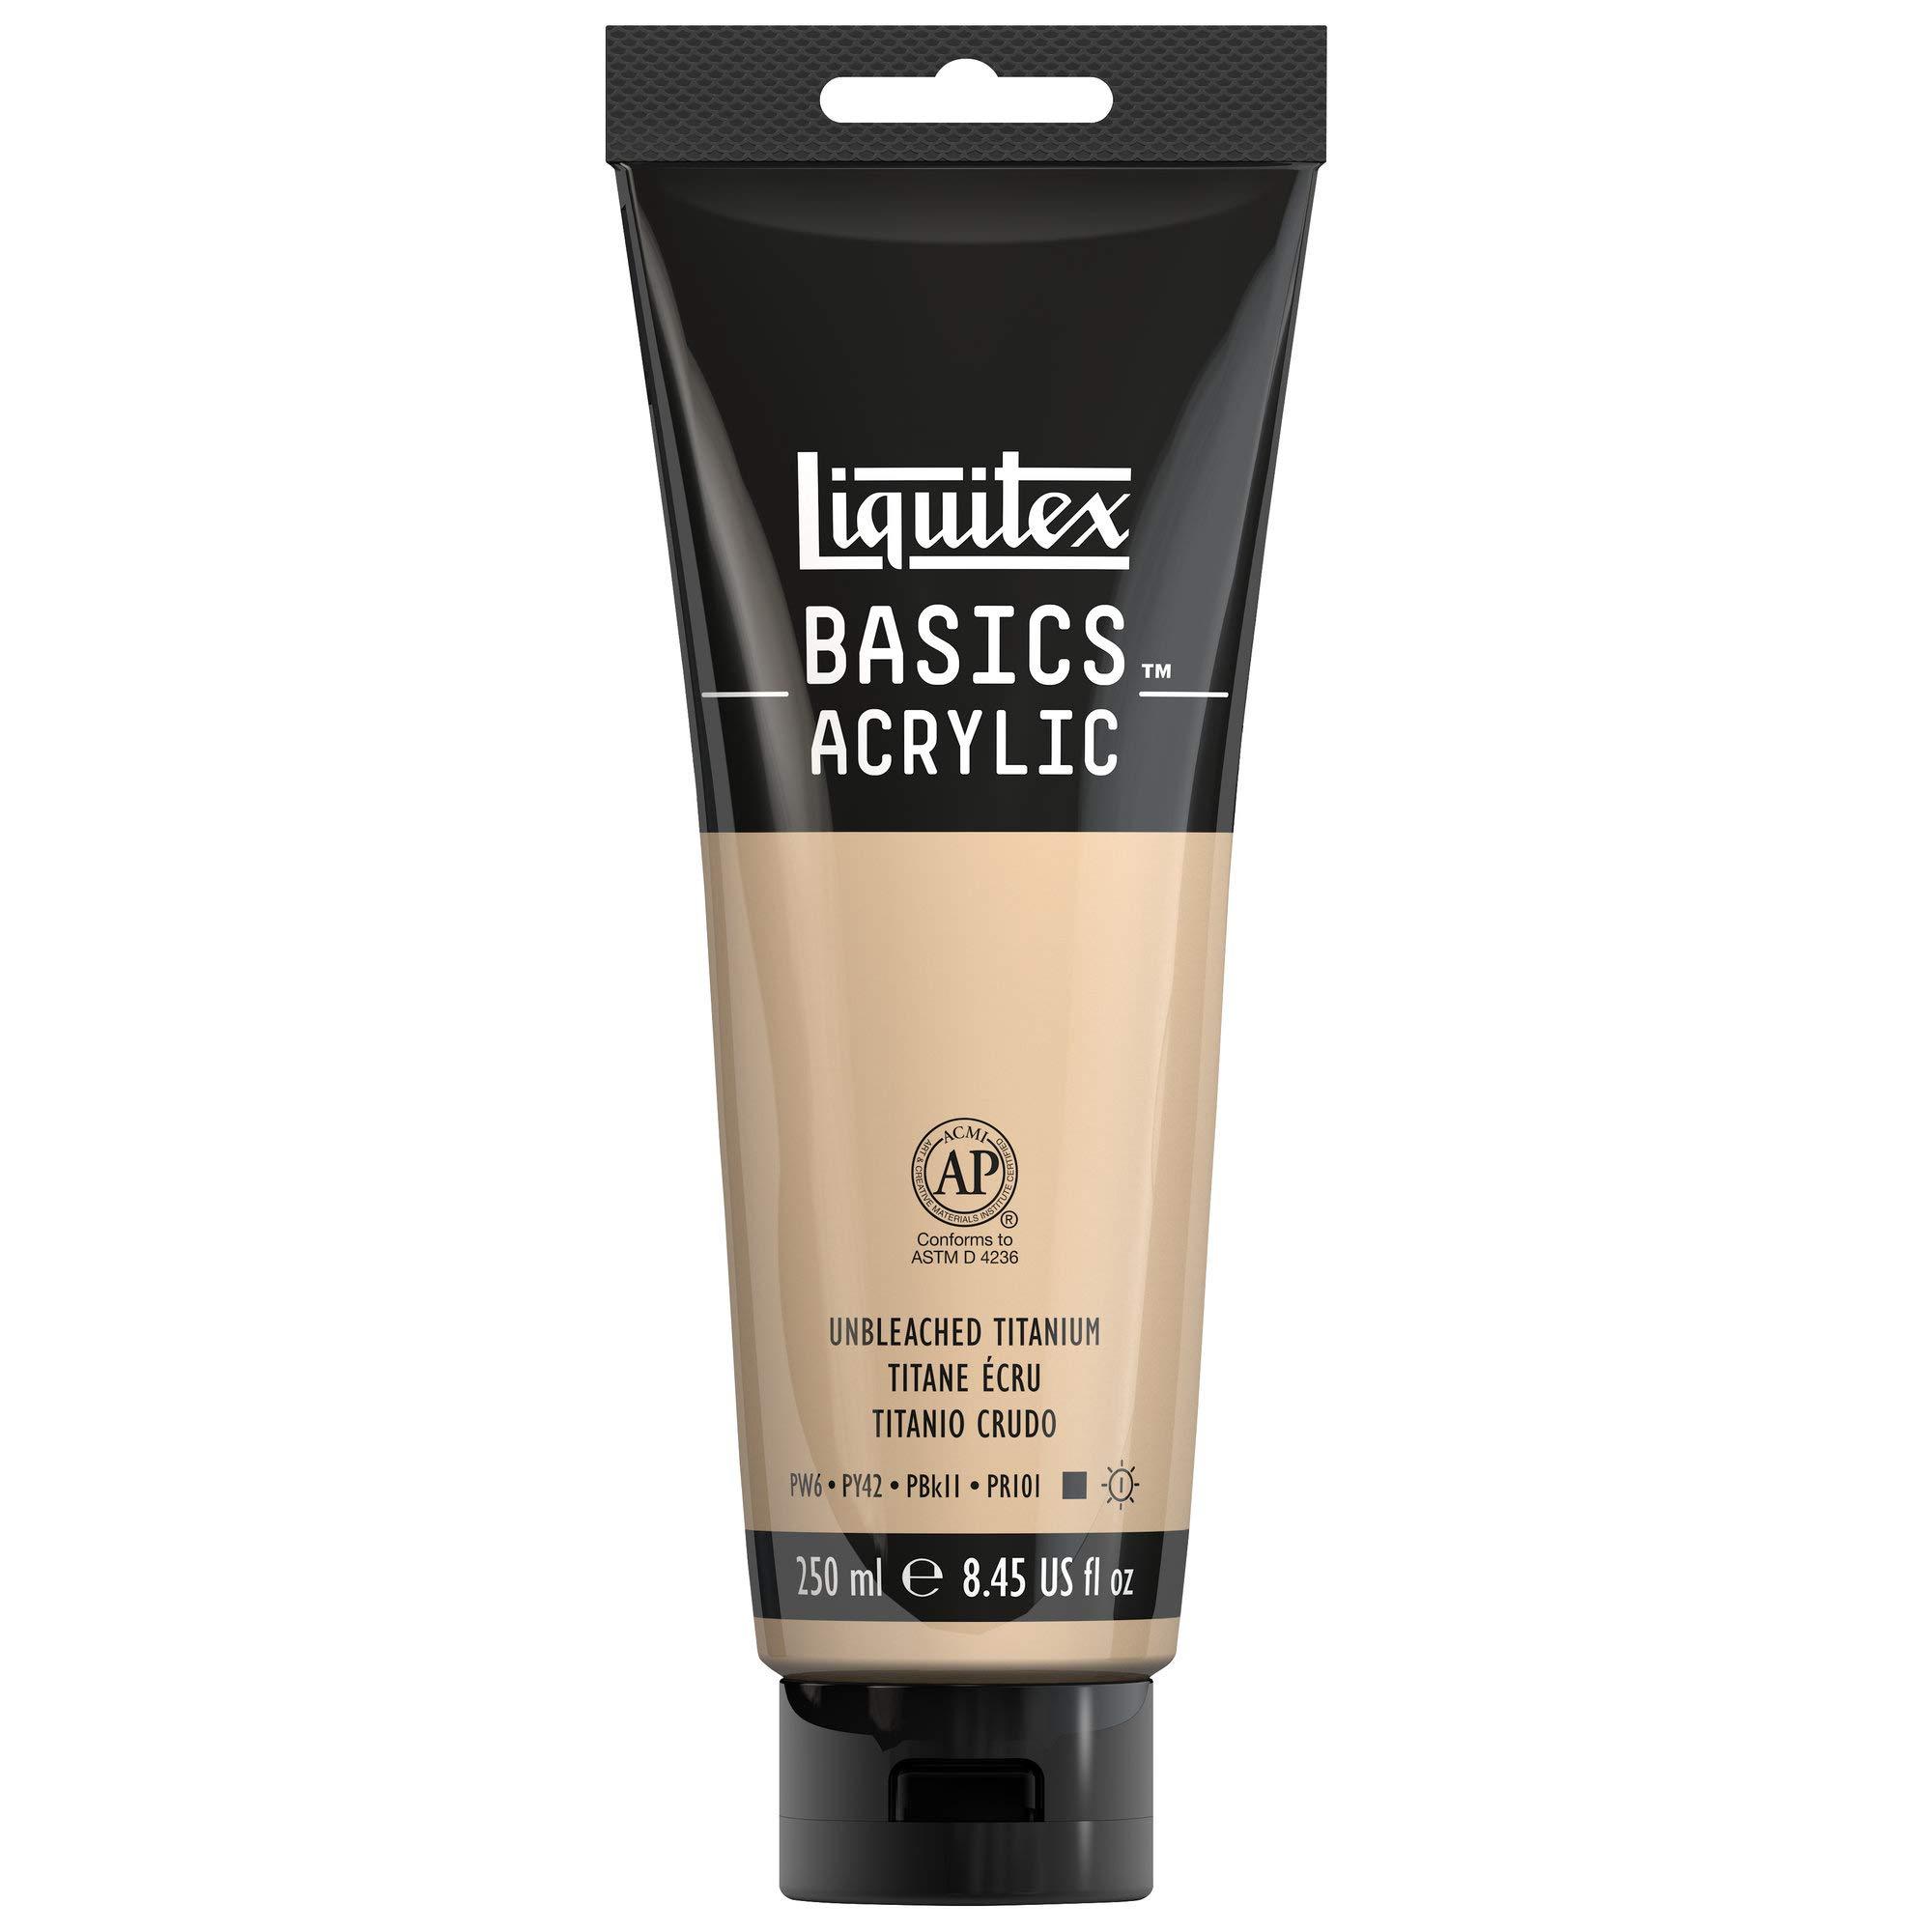 Liquitex BASICS Acrylic Paint, 8.45-oz tube, Unbleached Titanium